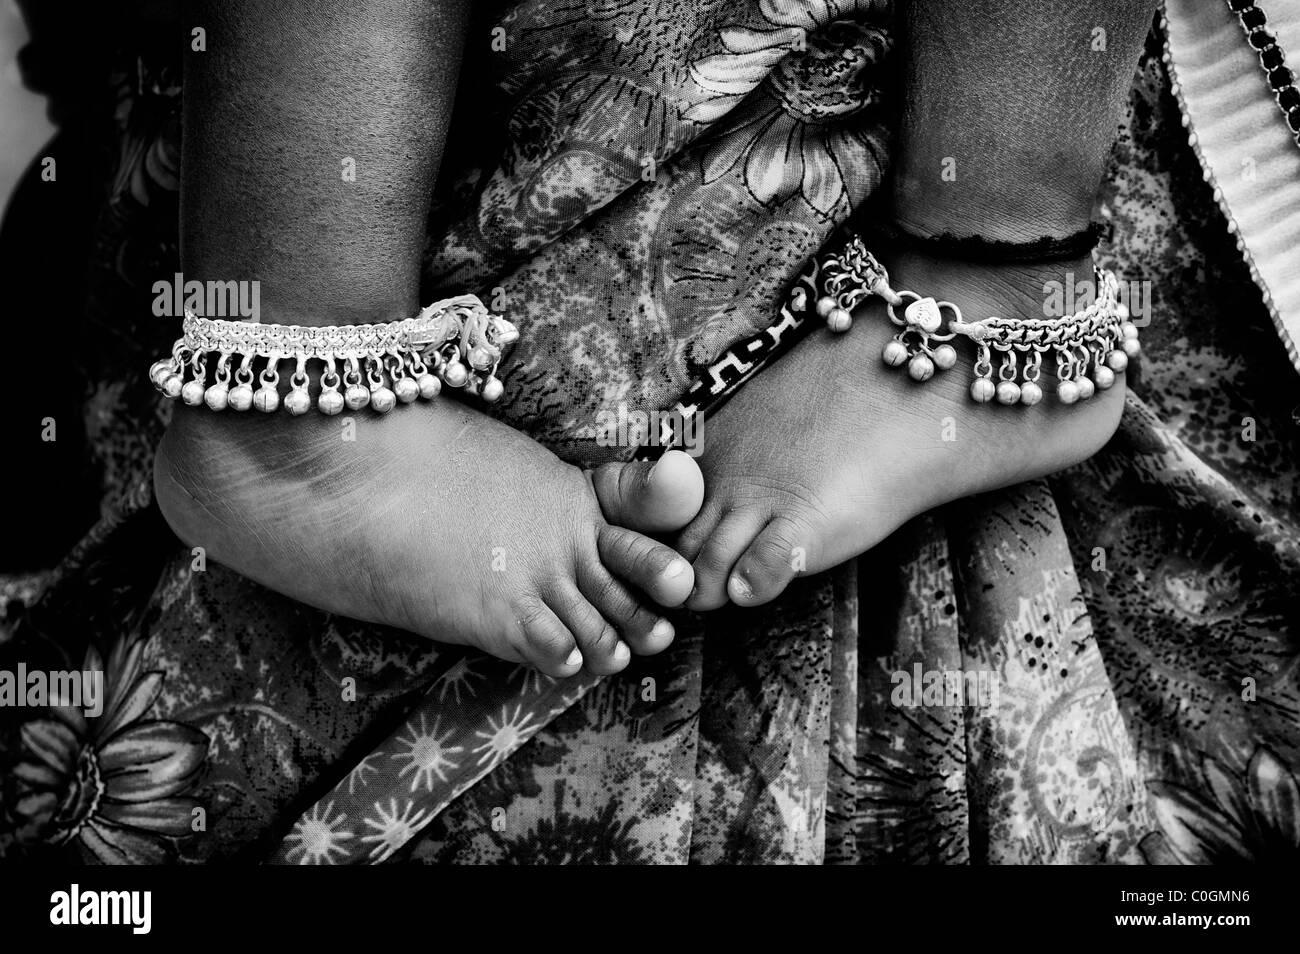 Indische Kinder barfuß gegen Mütter floral Sari. Monochrom Stockbild